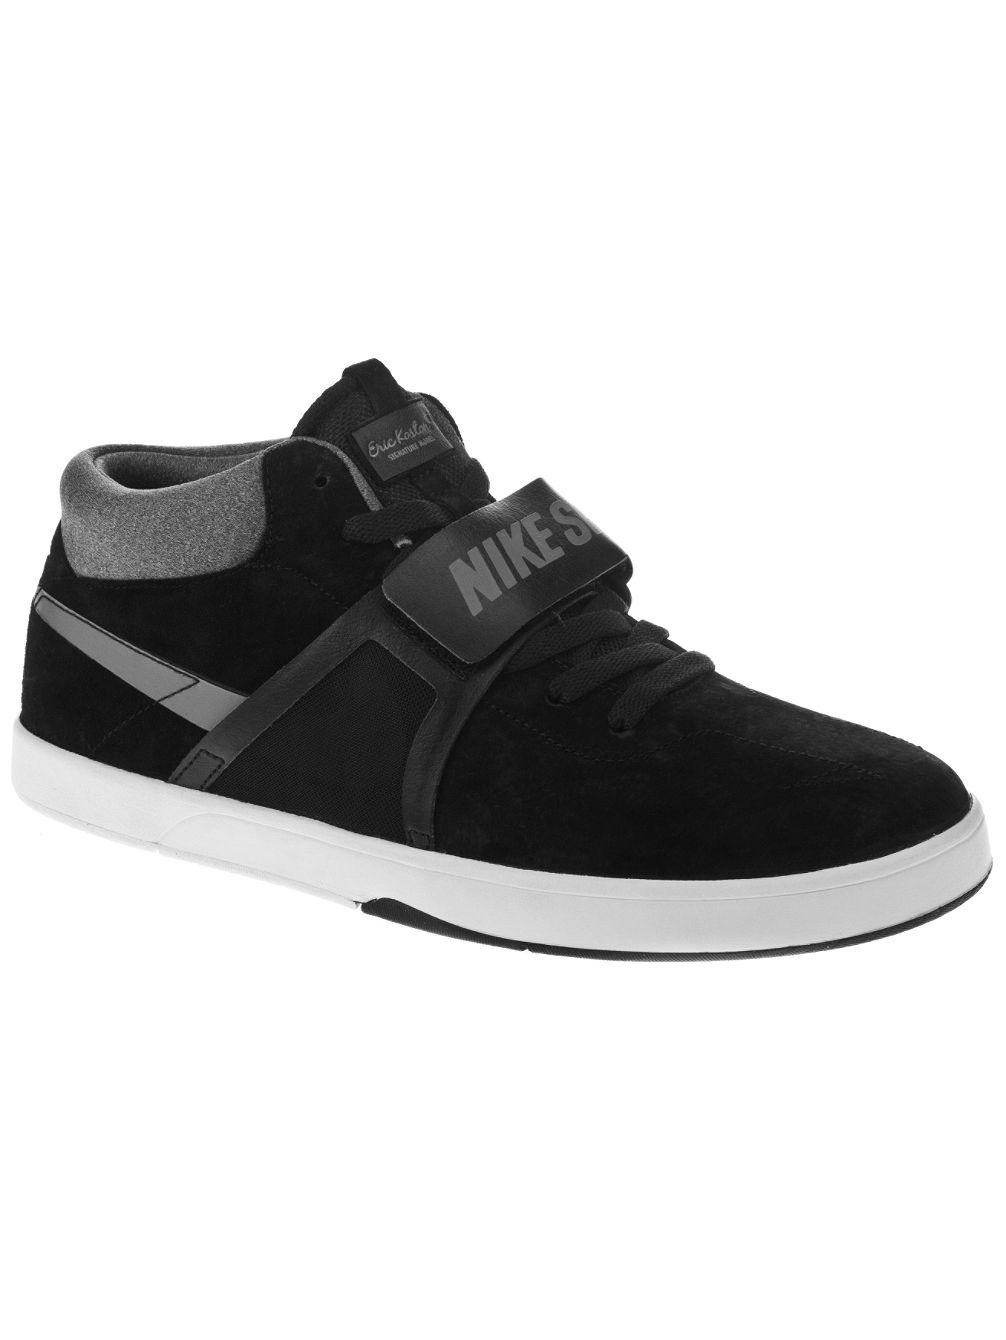 Nike Eric Koston Mid Premium Sneakers - nike - blue-tomato.com